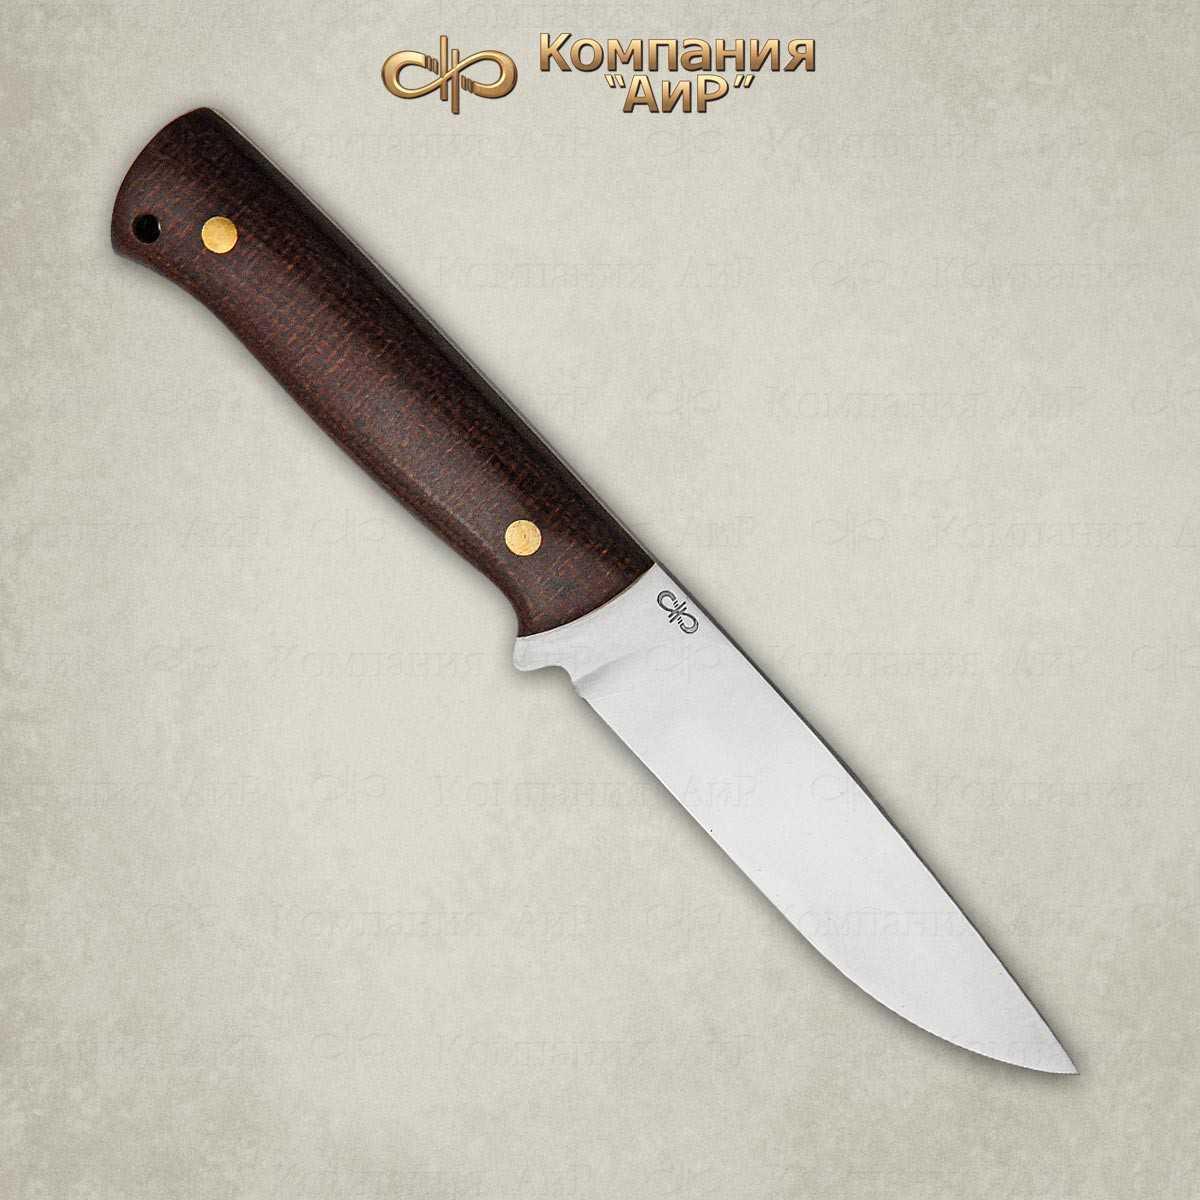 Нож цельнометаллический Стриж, АиР, текстолит, 100х13м